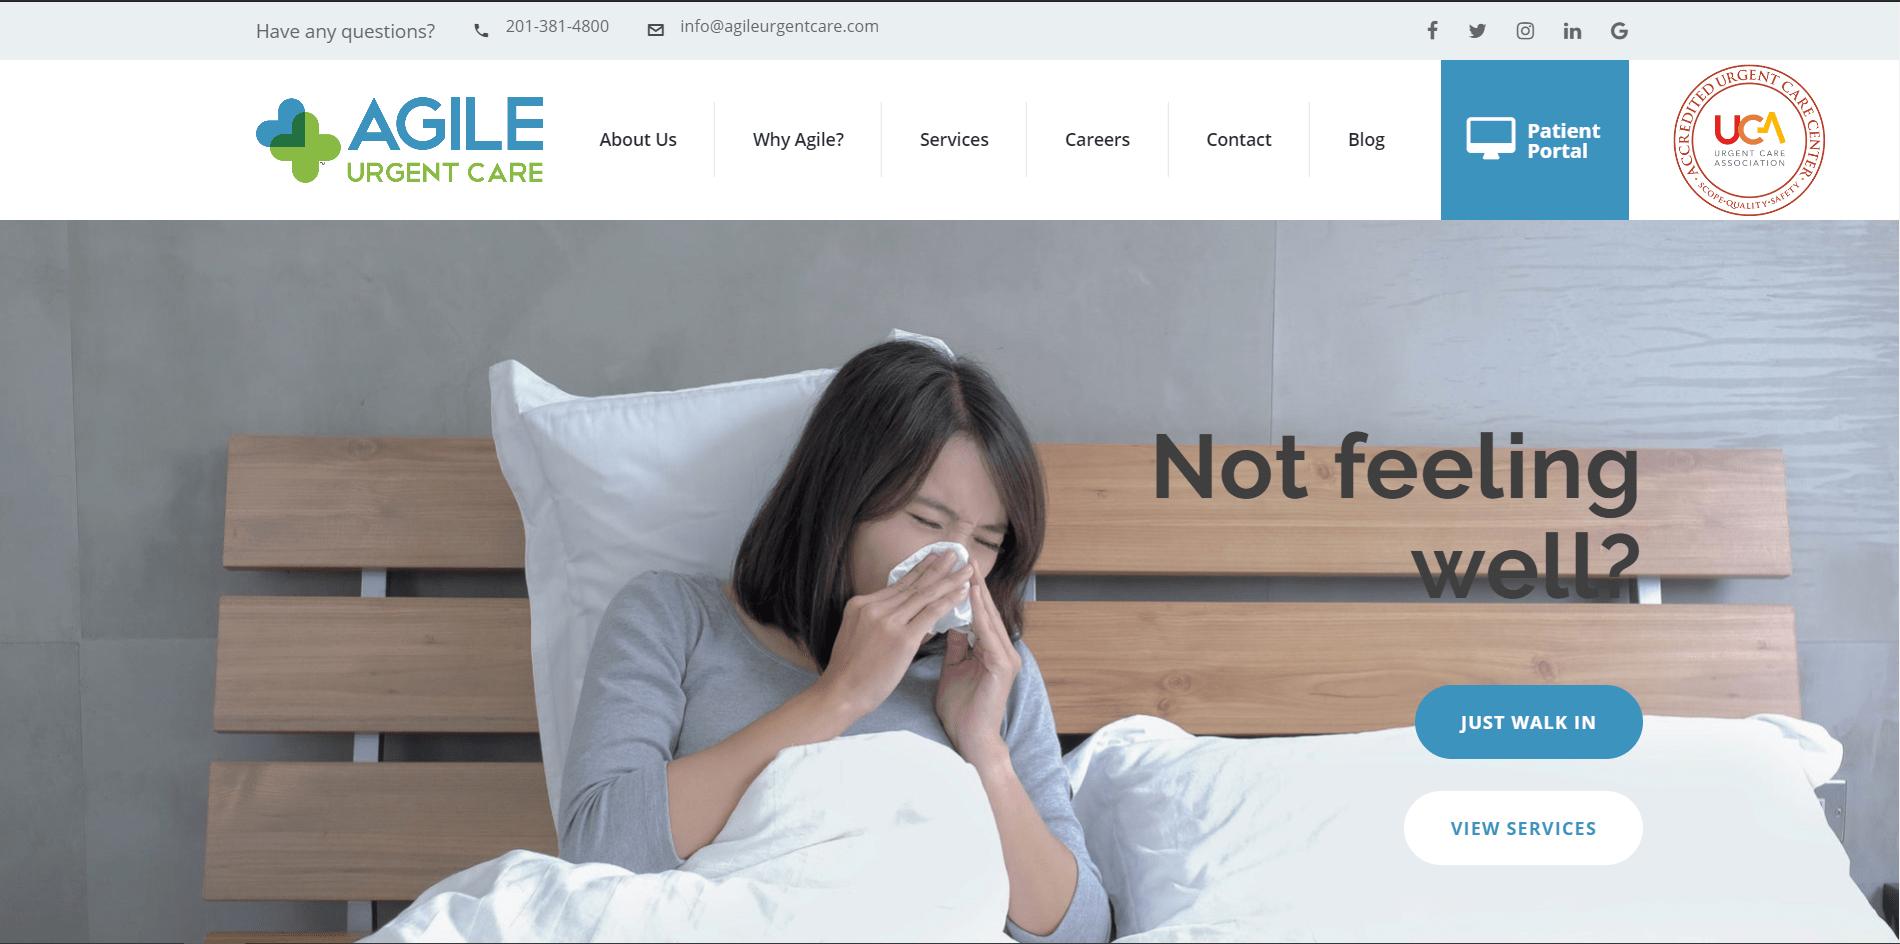 "<a href=""https://www.agileurgentcare.com/"">agileurgentcare.com/</a>"